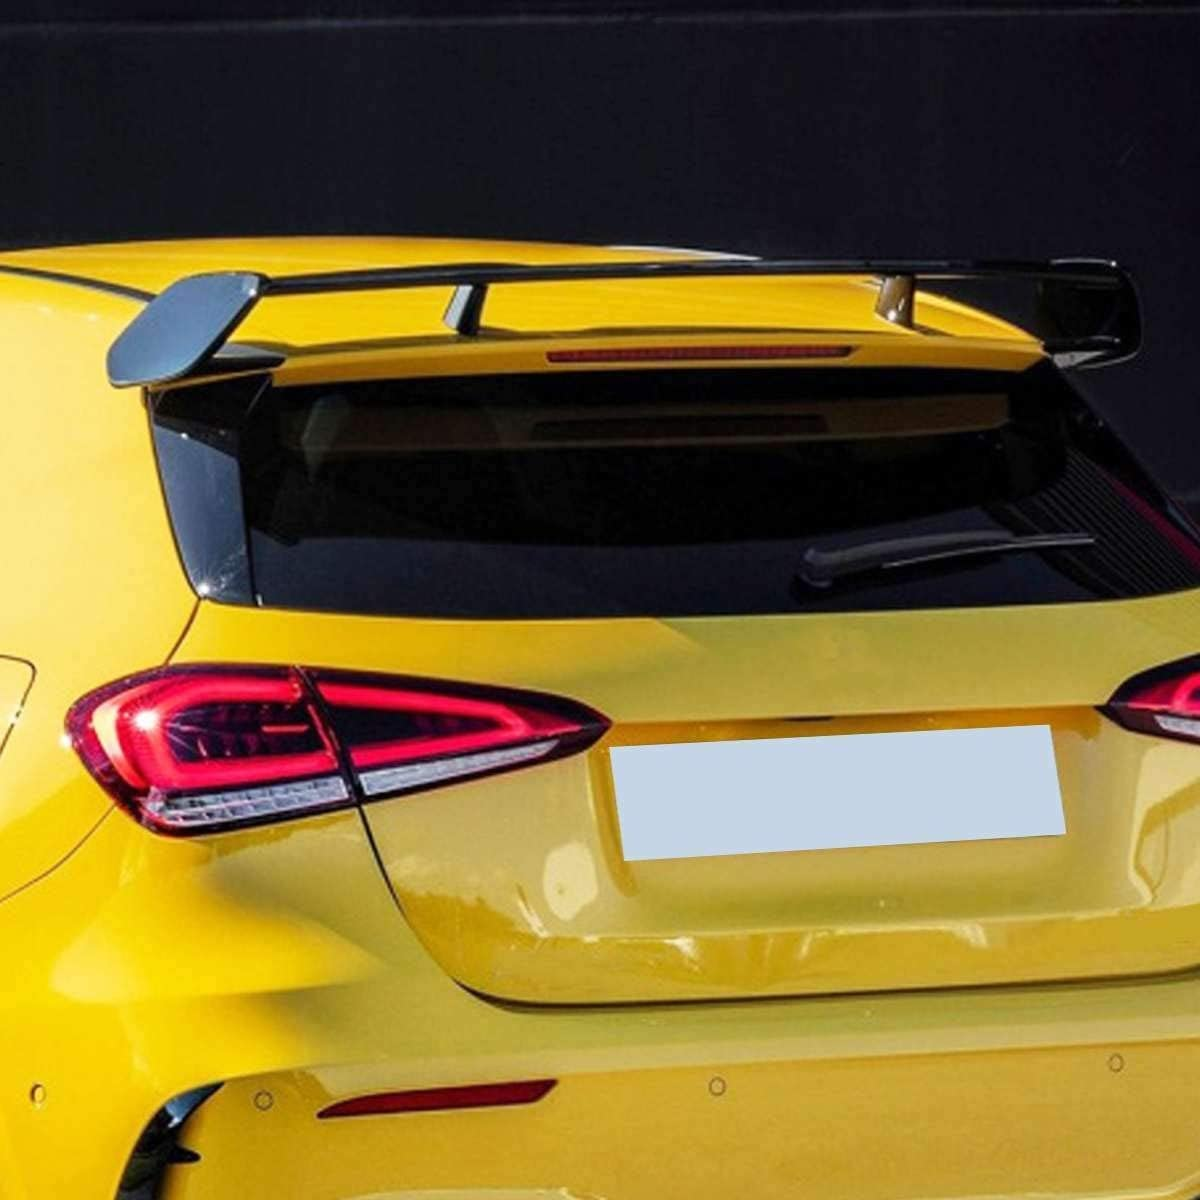 Coffre de voiture arri/ère Splitter Air Glossy un becquet Wing for Mercedes Benz Classe for W177 A35 A180 A200 A220 A260 for AMG 2019+